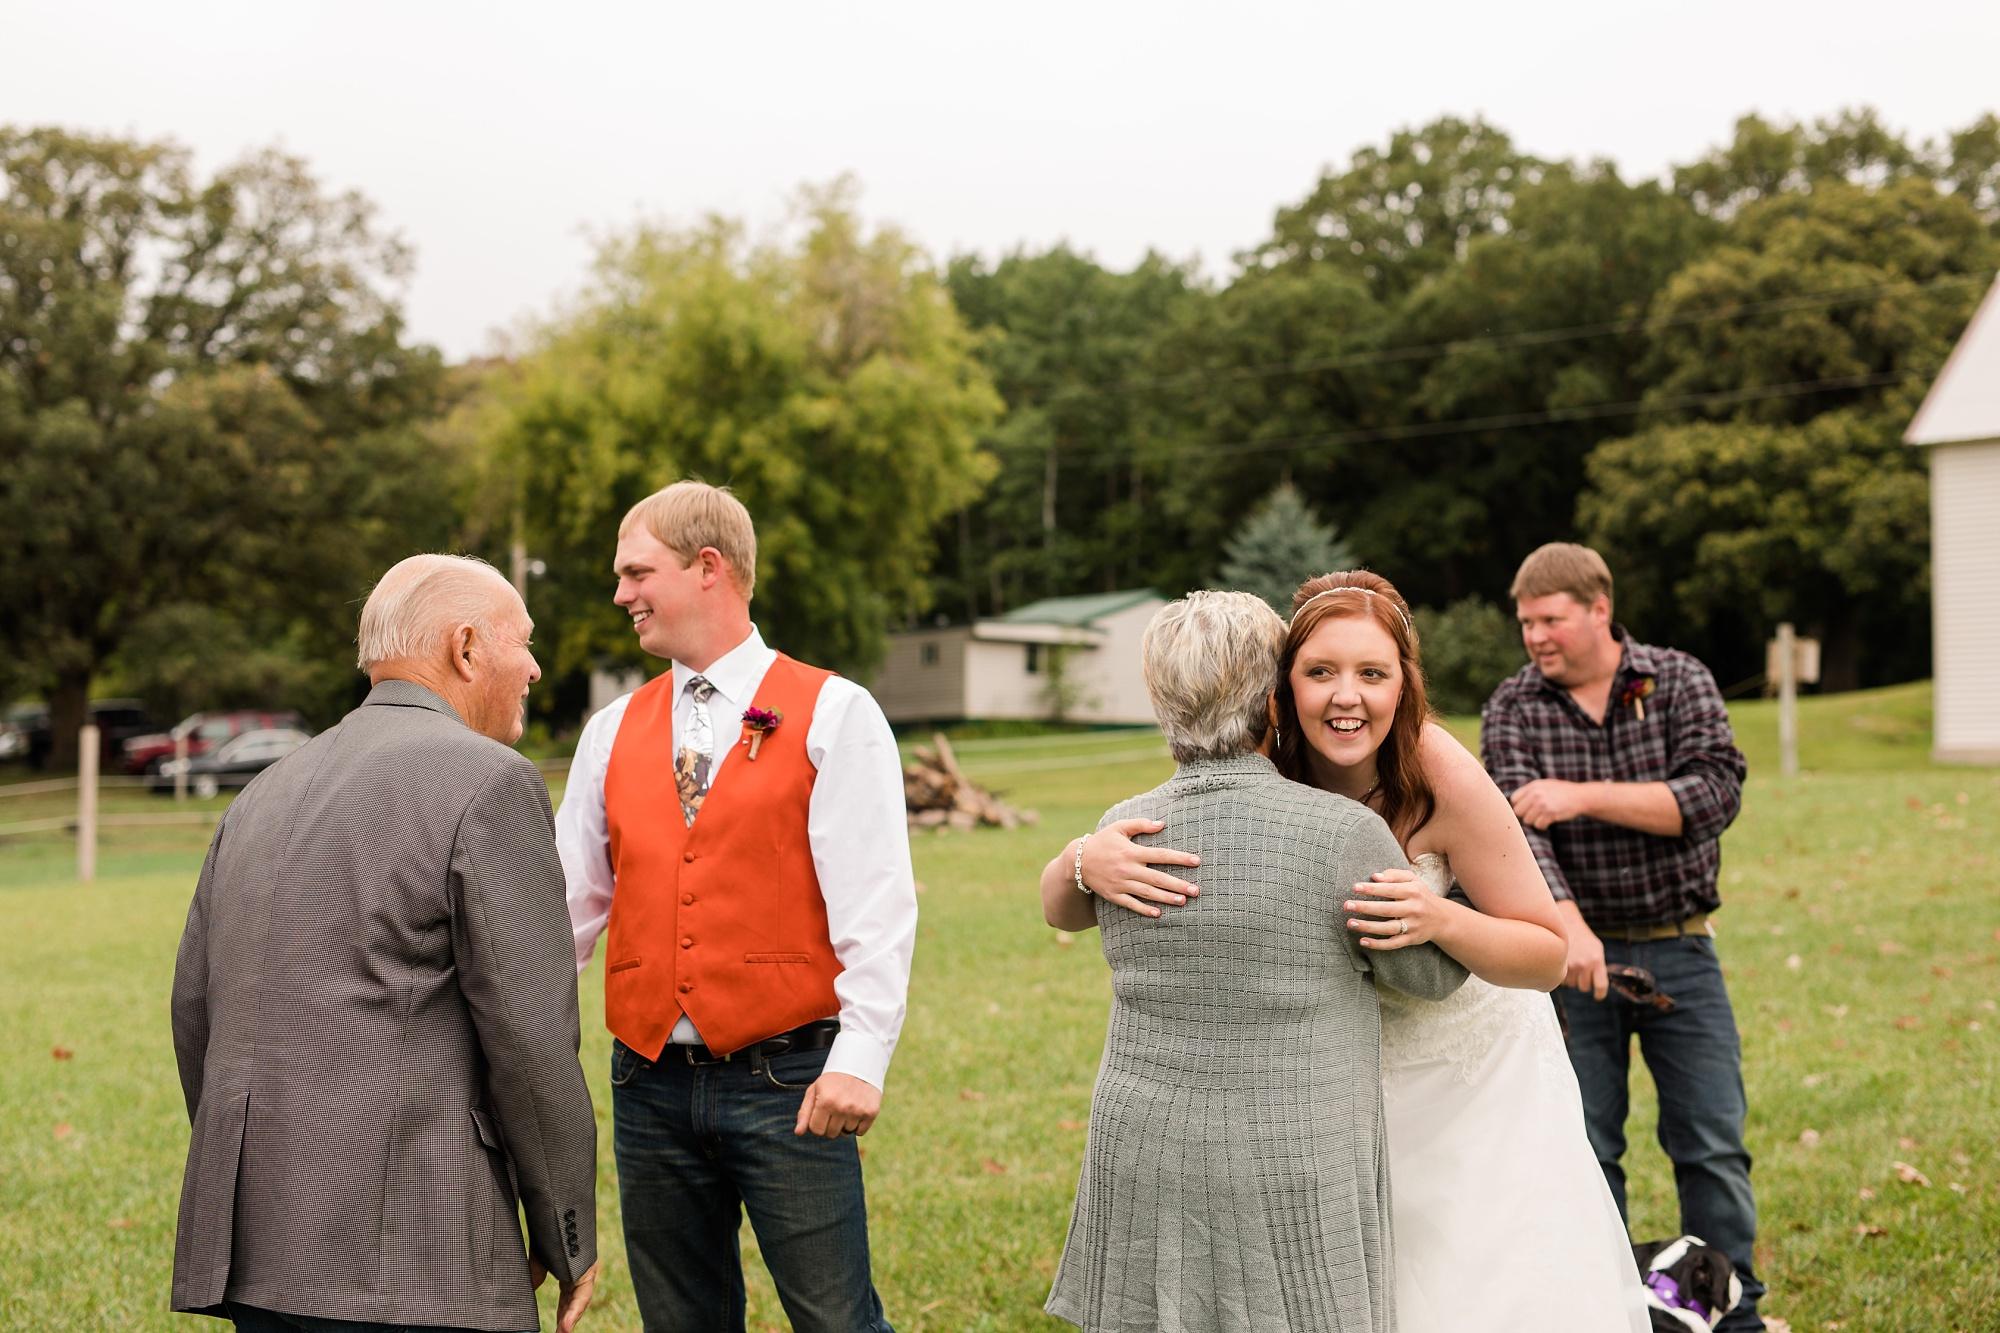 Amber Langerud_Lake Park MN Barn wedding at the Hitching Post_0452.jpg